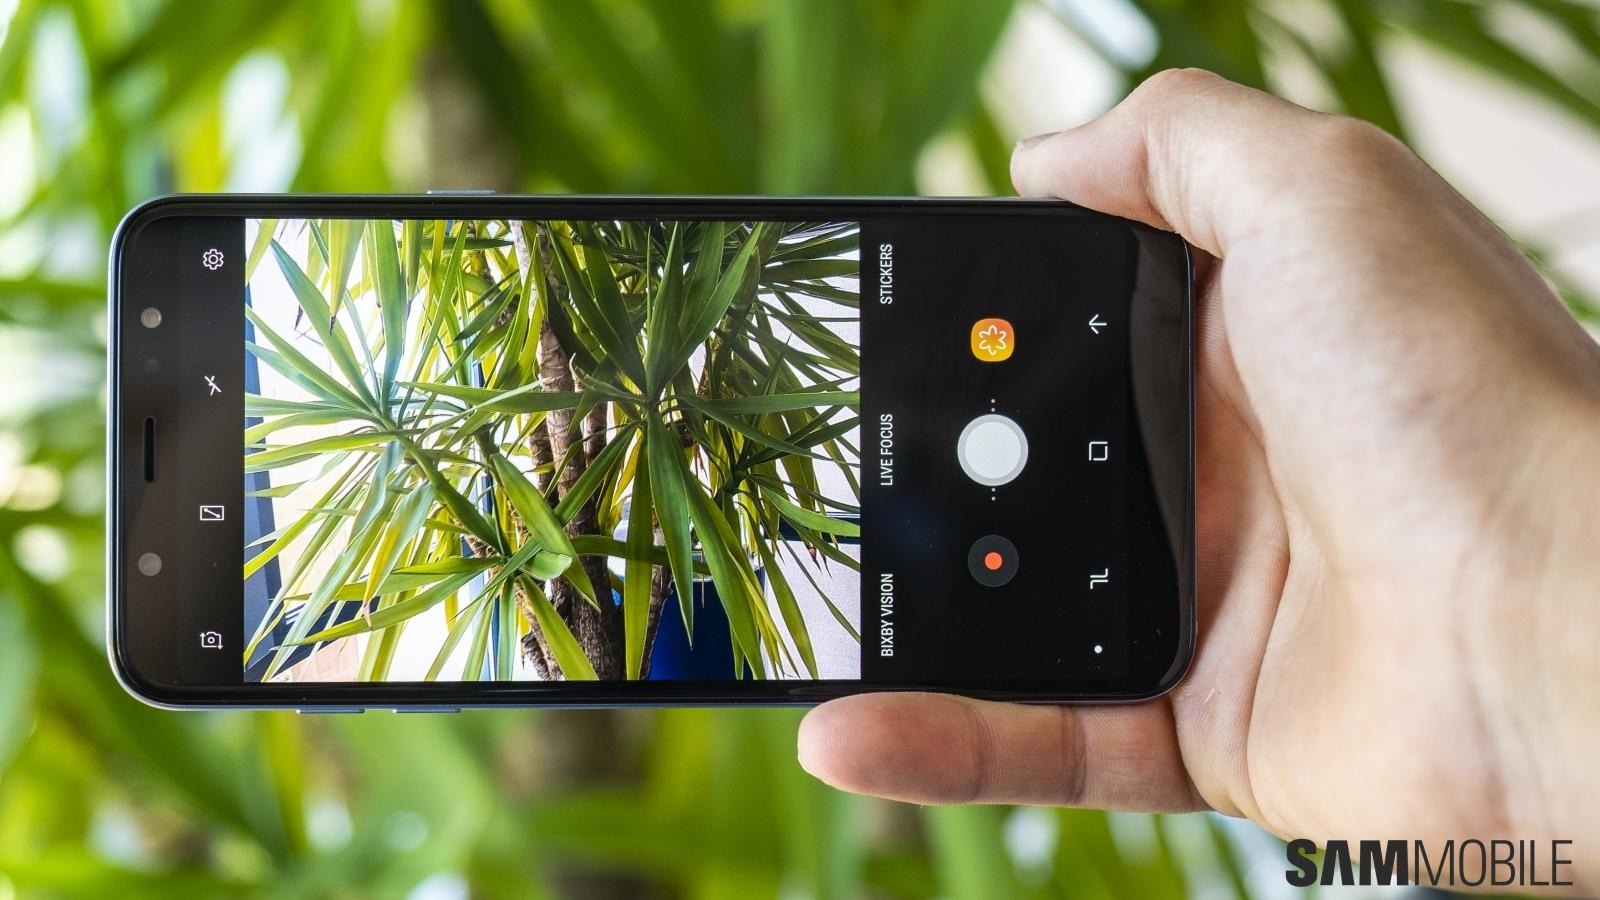 Samsung Galaxy A6 Plus review